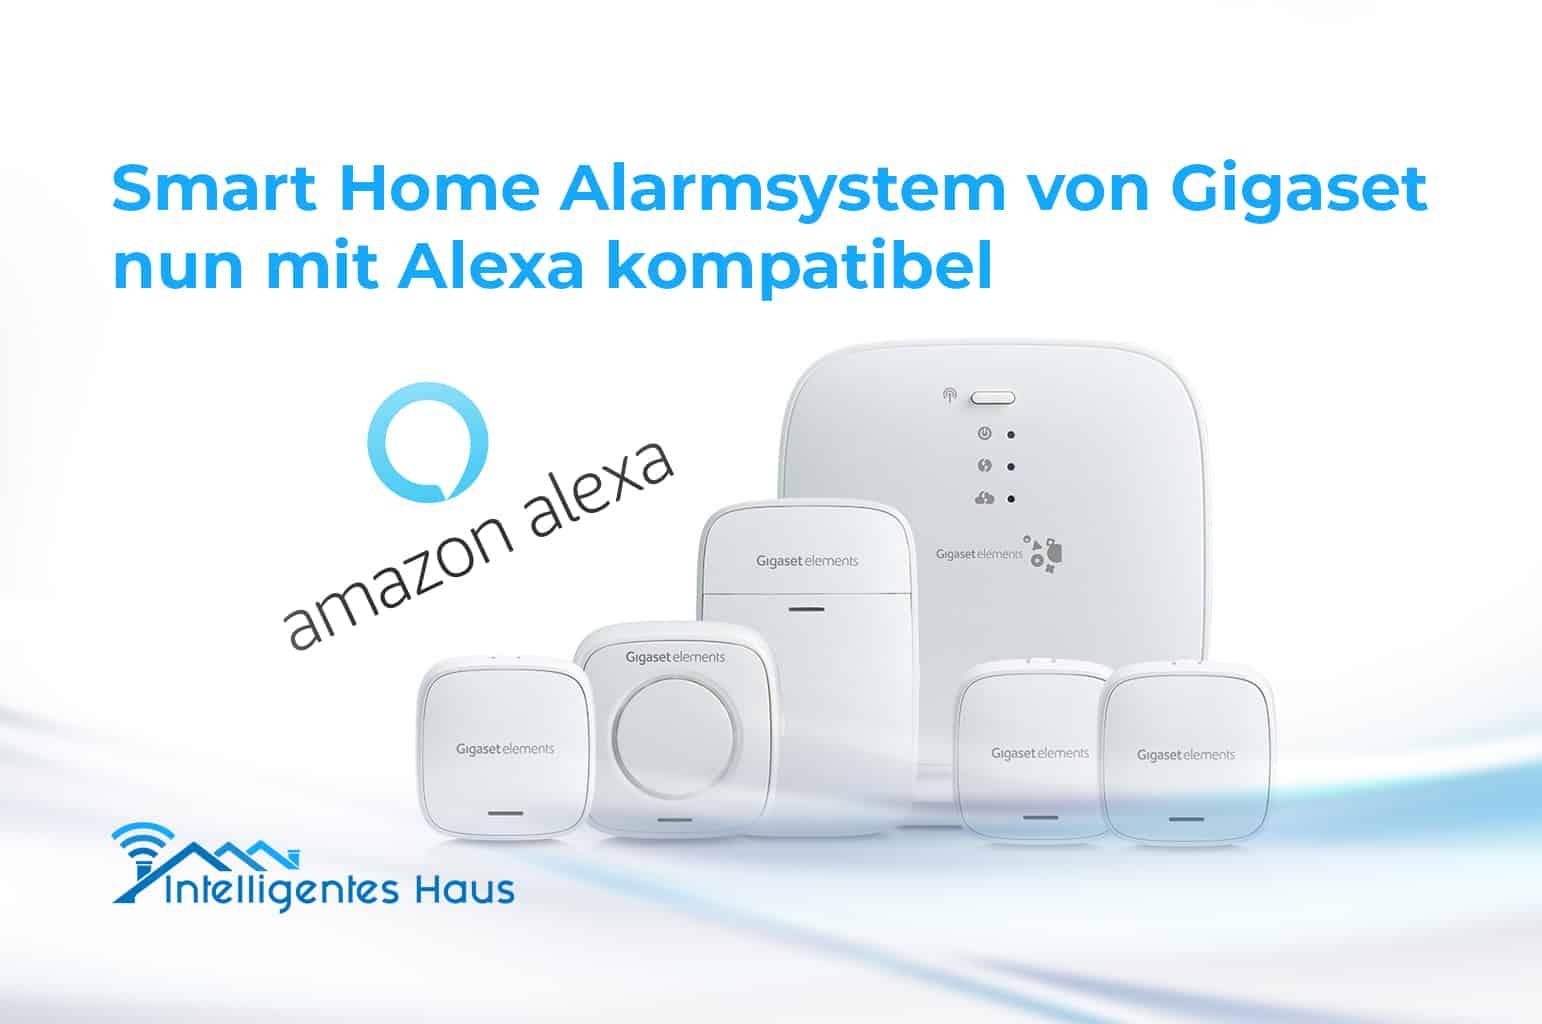 alexa funktioniert jetzt mit gigaset smart home alarmsystem. Black Bedroom Furniture Sets. Home Design Ideas